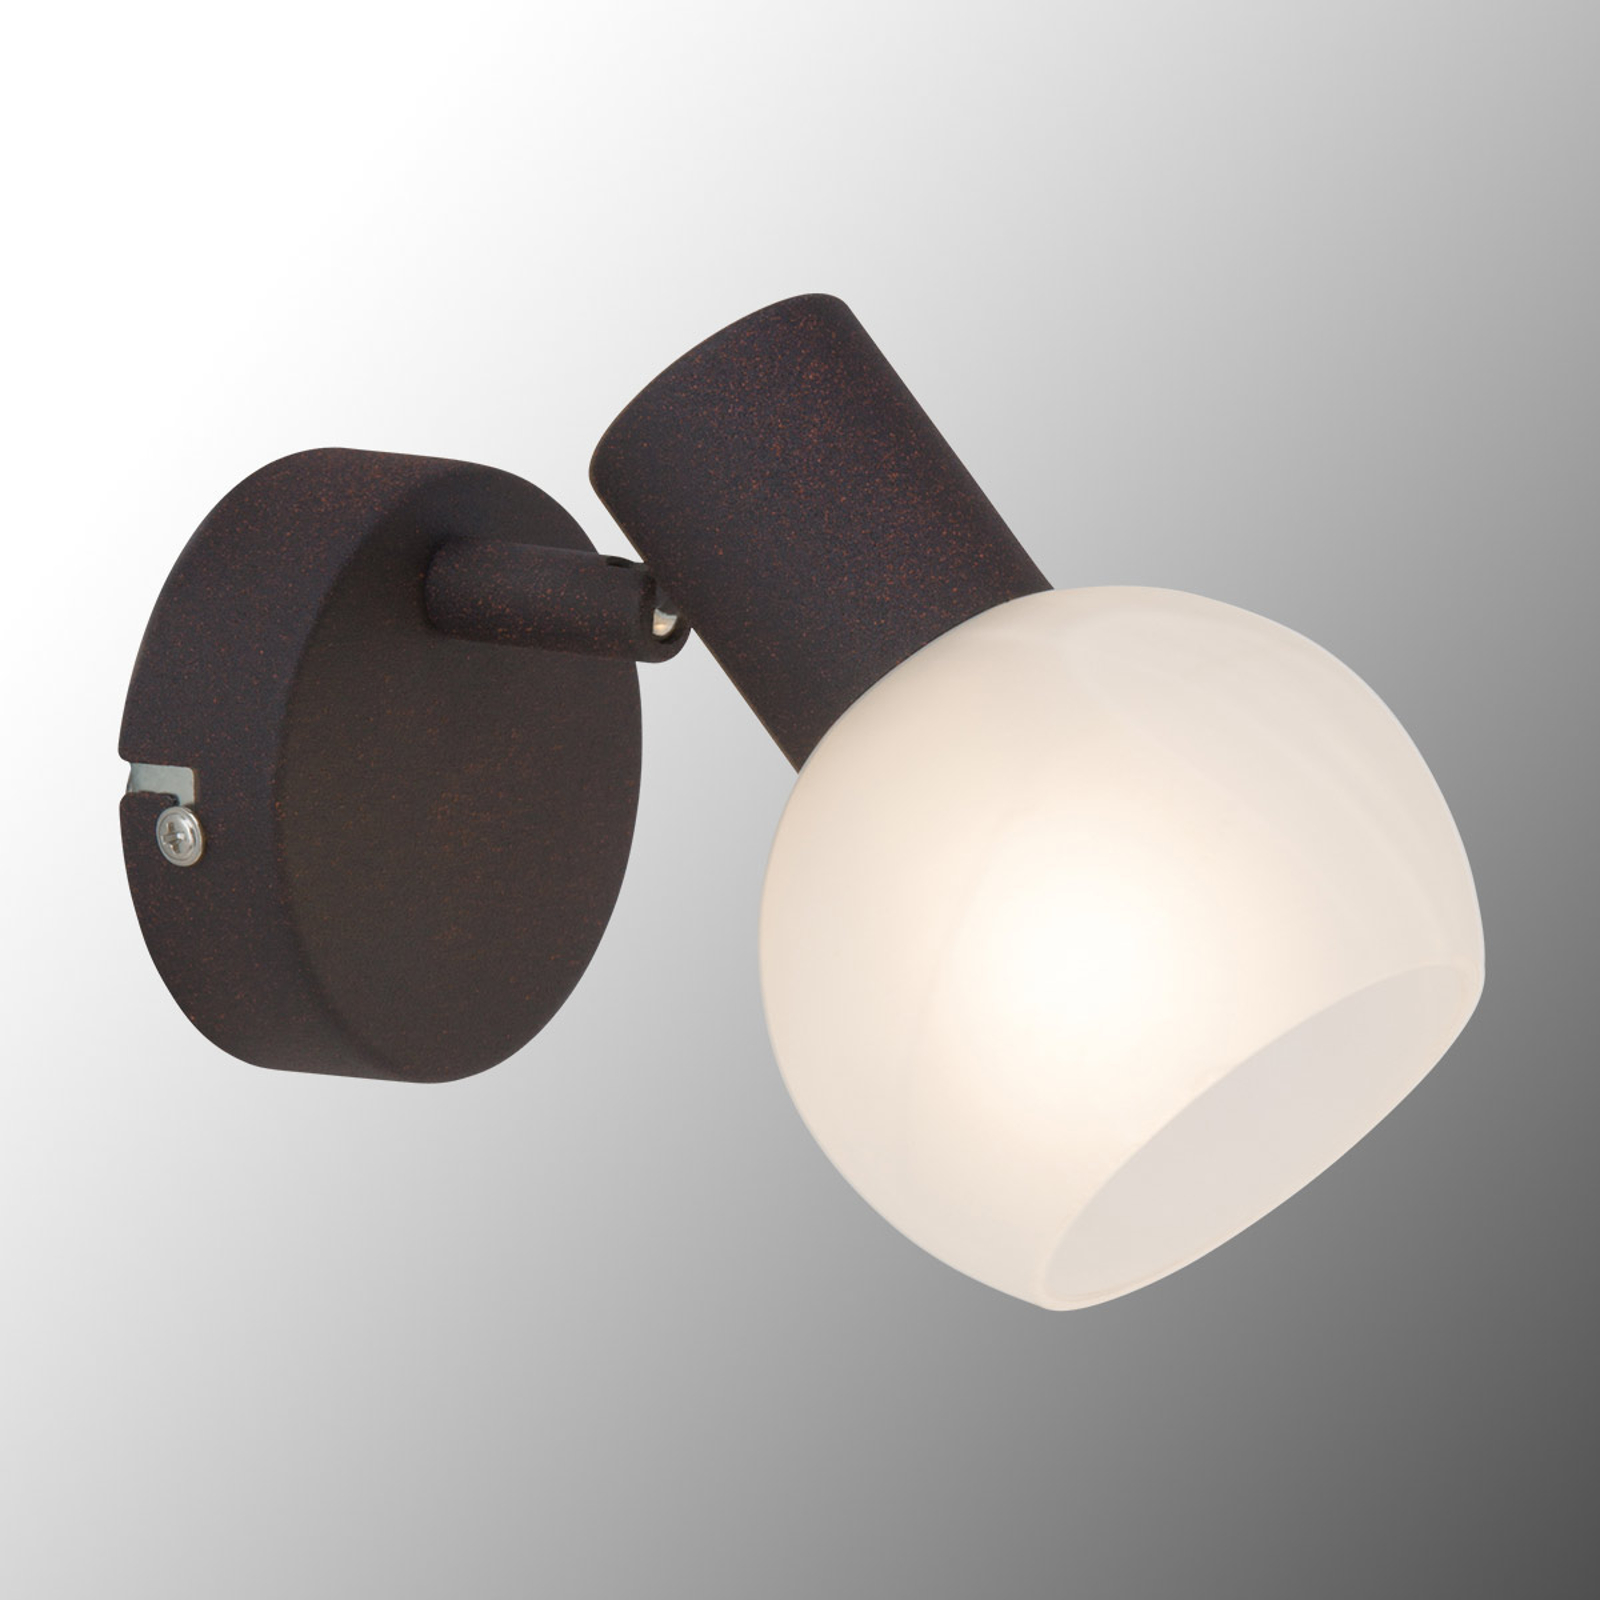 Kontrastująca lampa ścienna Gabon